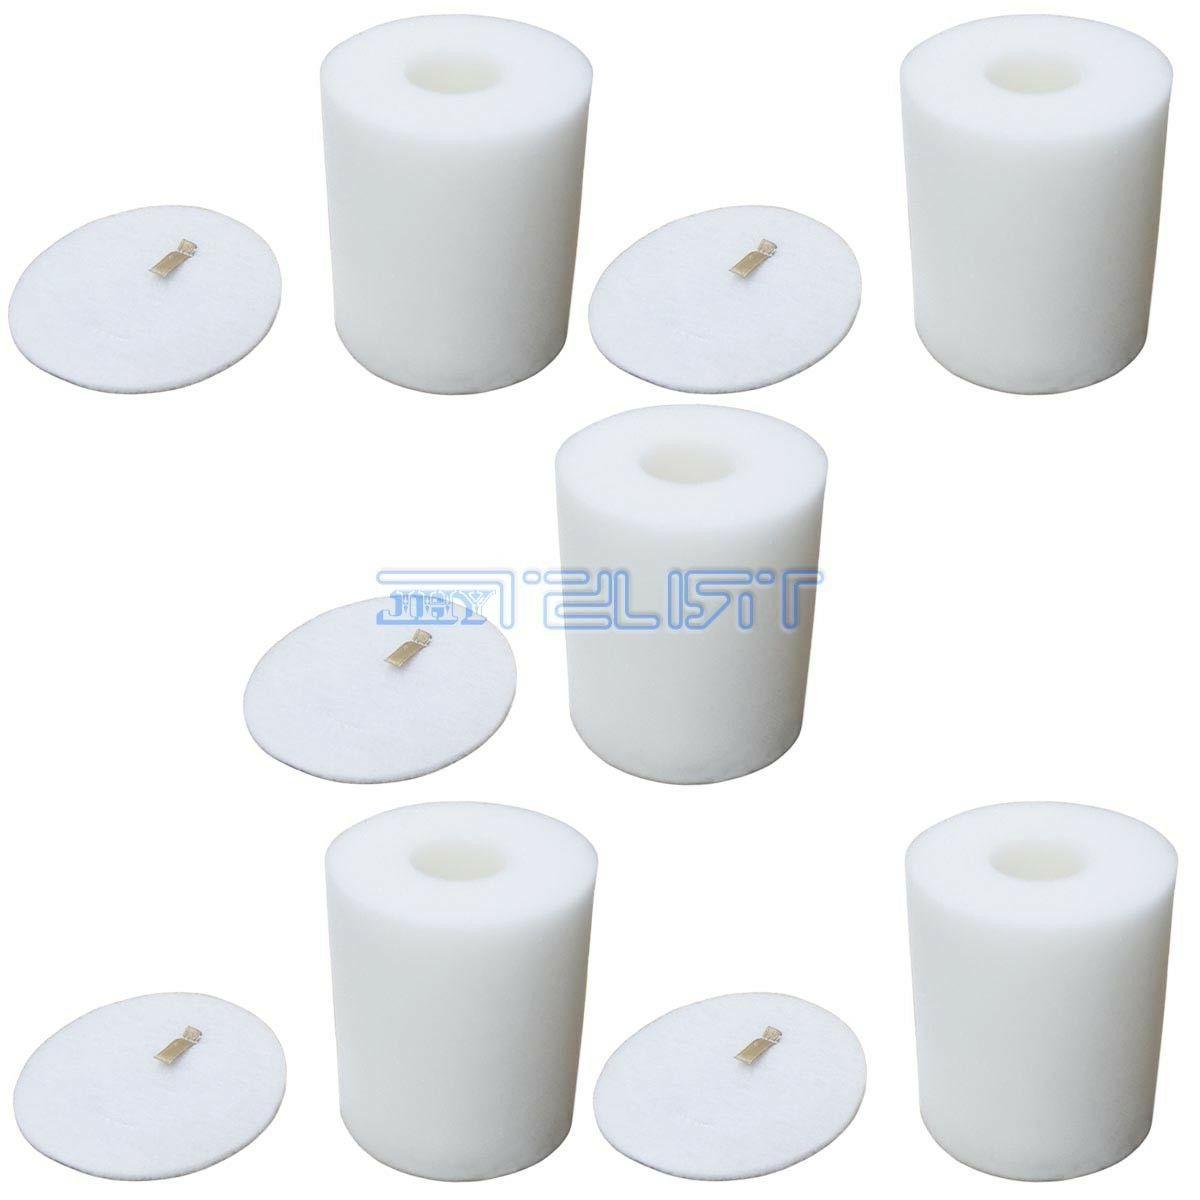 5 x foam and felt filters